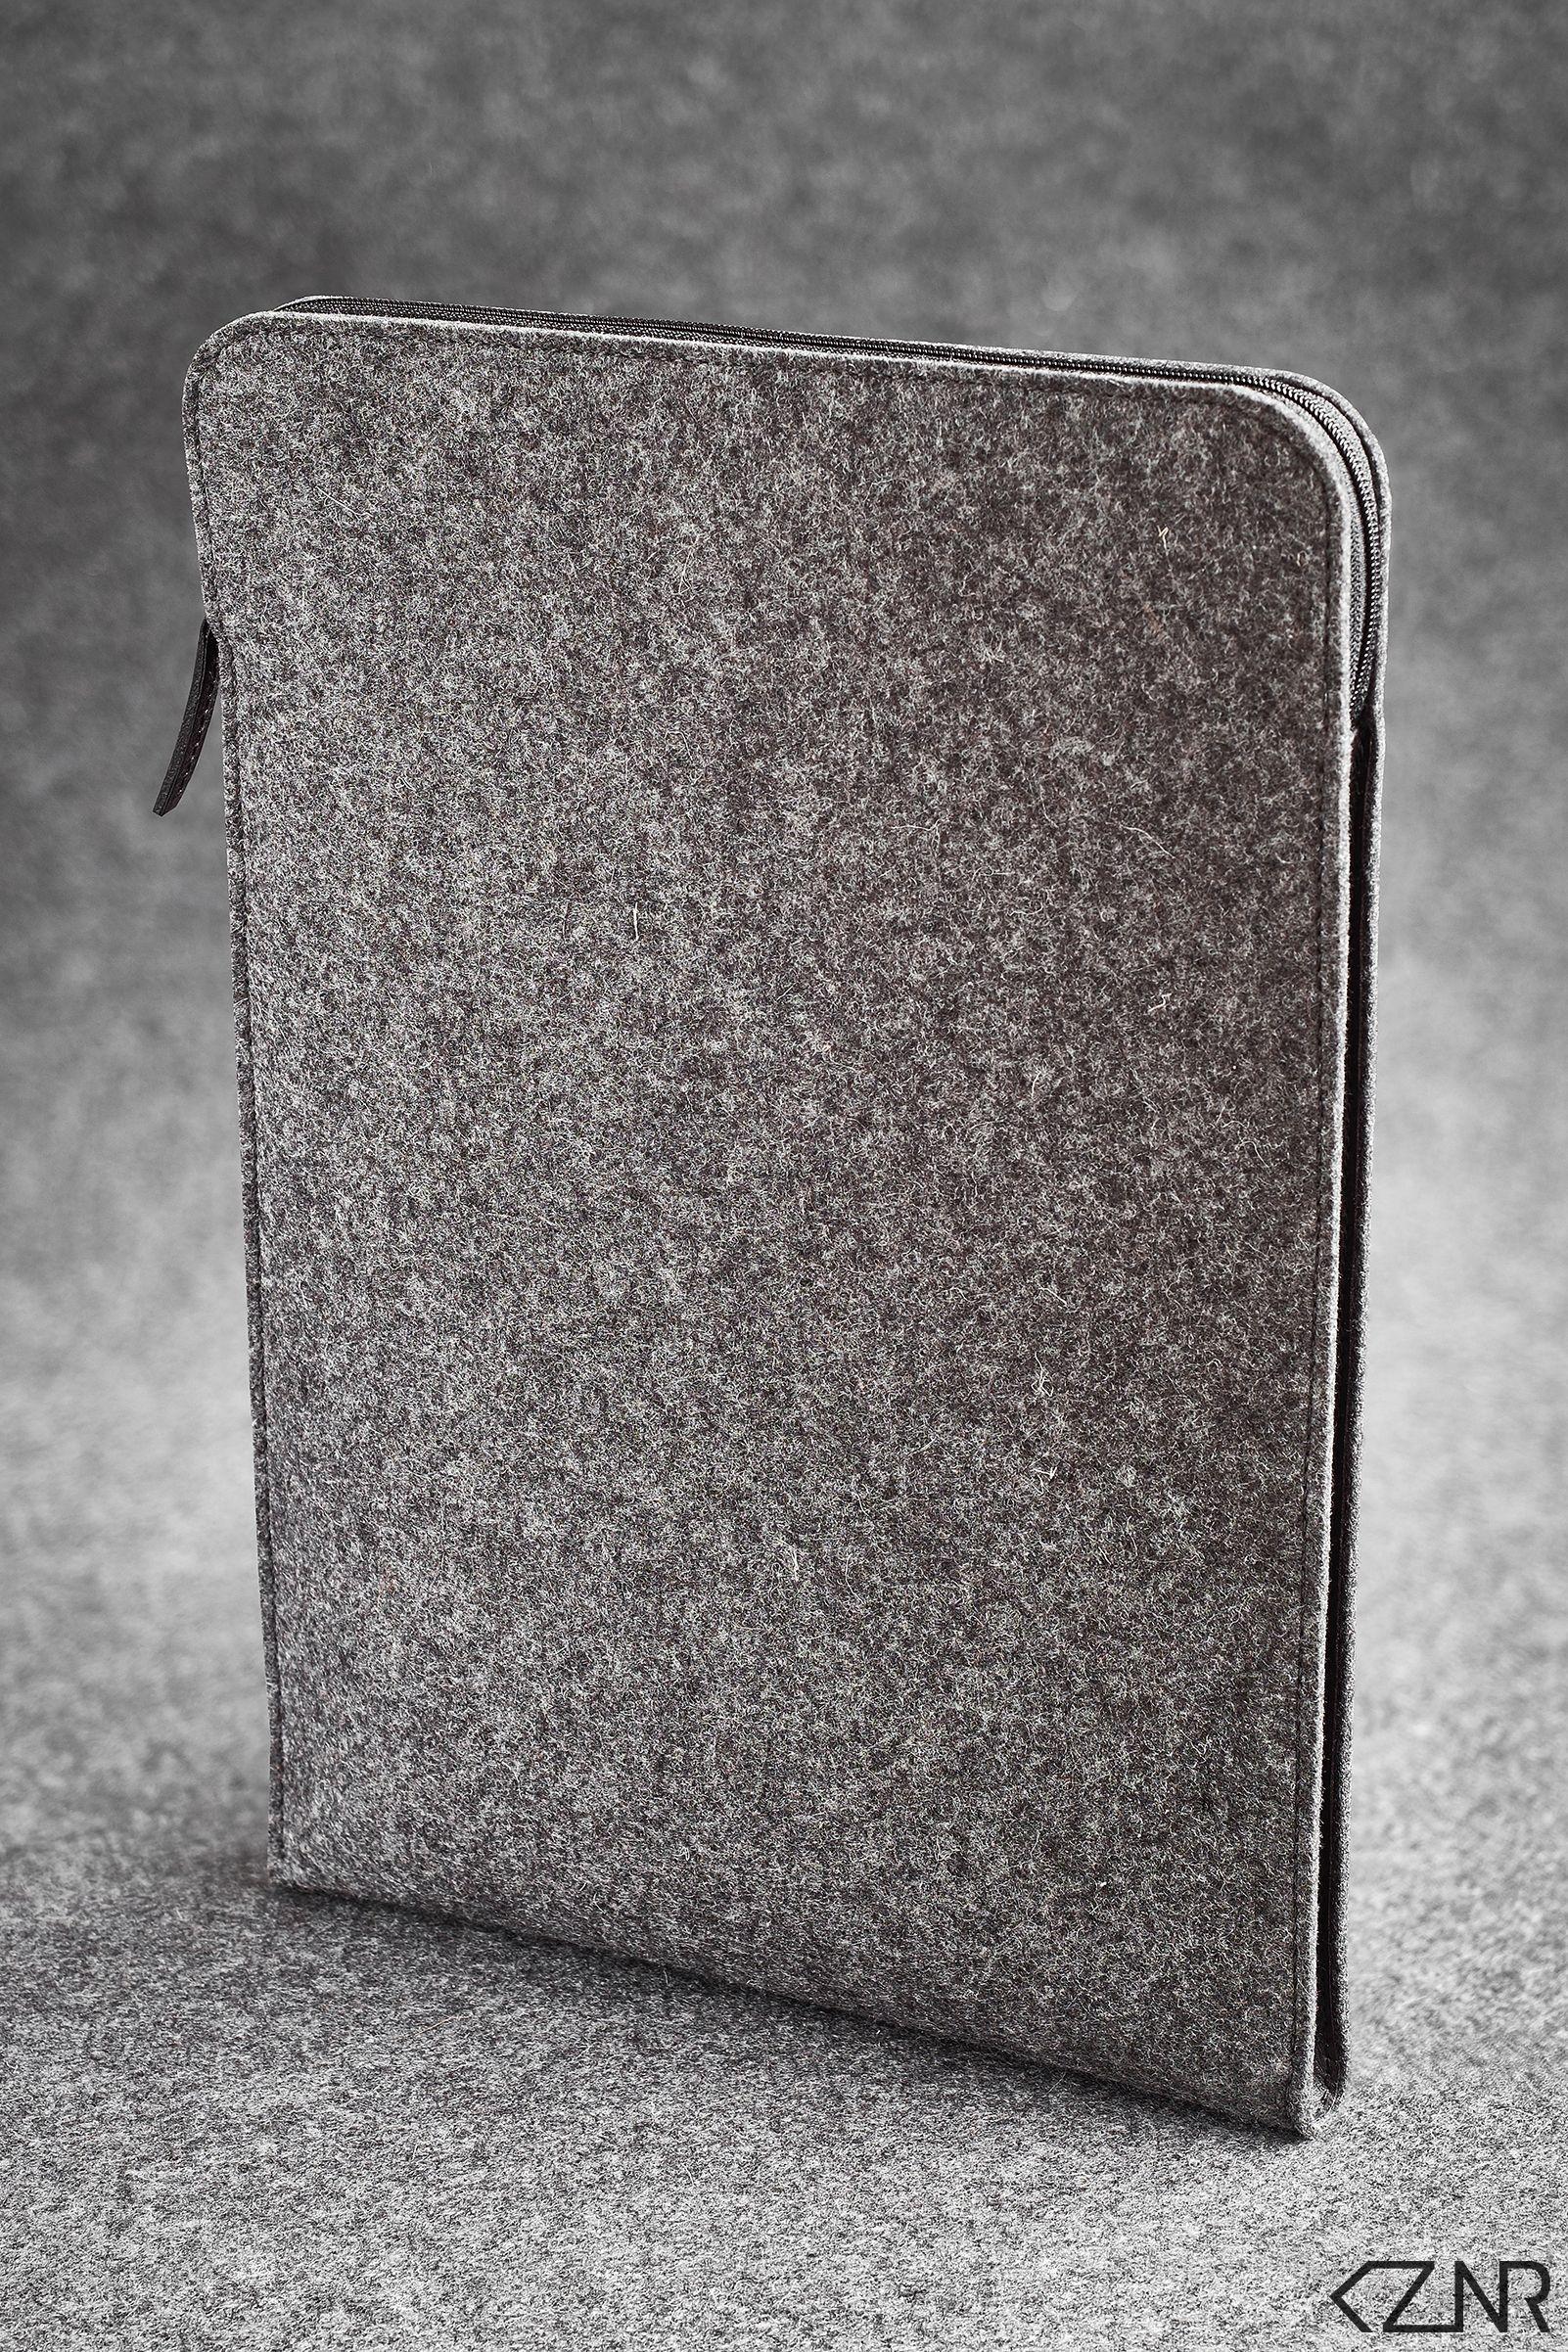 Laptop Macbook Air Felt and Leather Folio Case Handmade